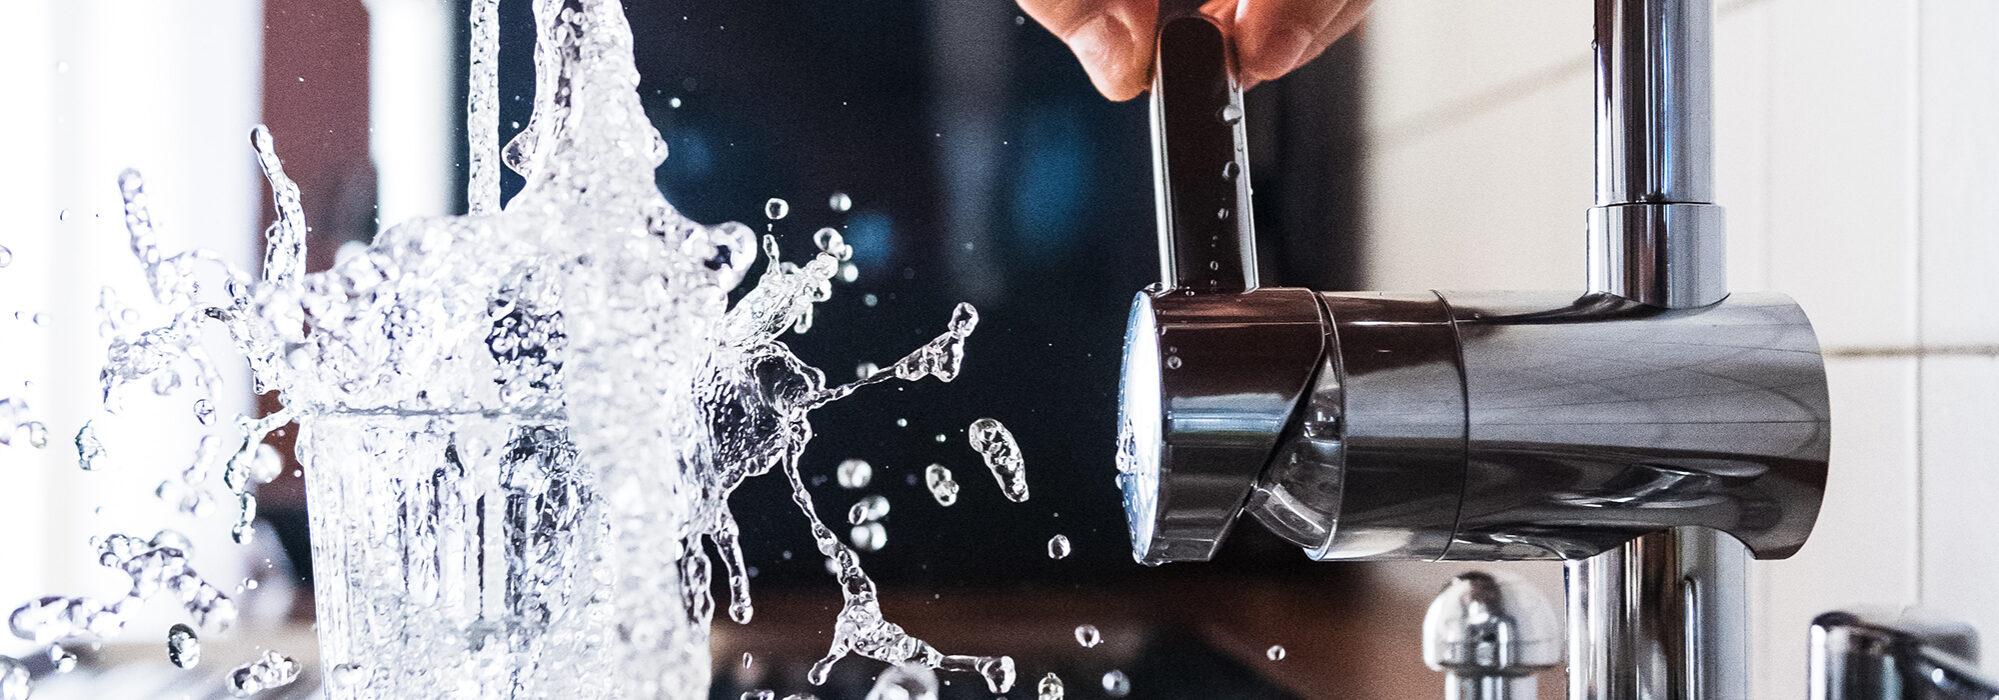 water-plumber